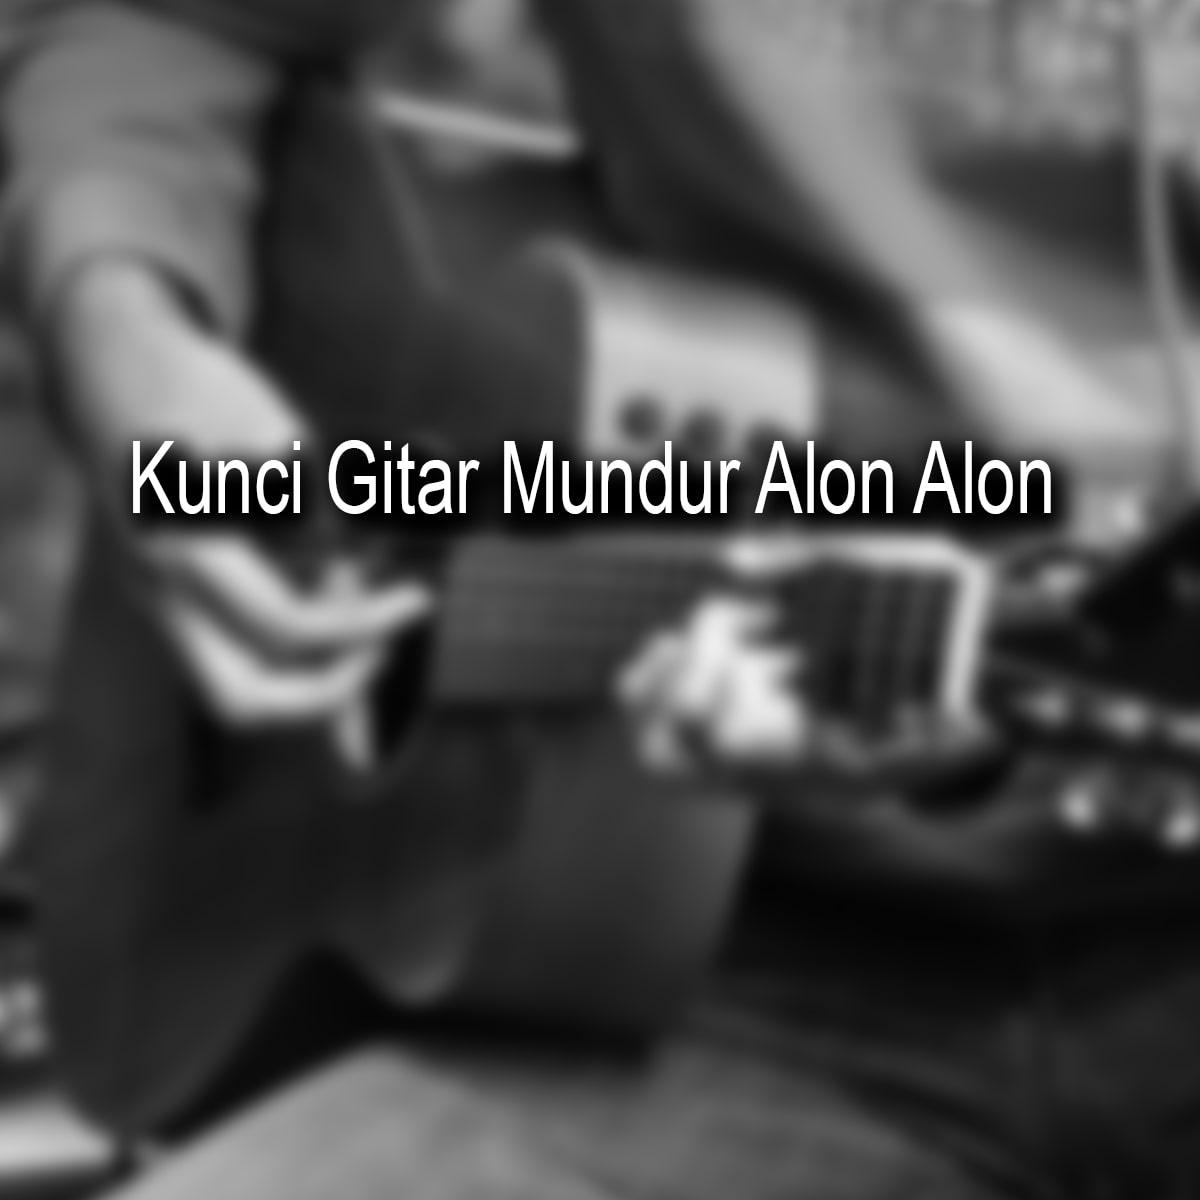 Kunci Gitar Mundur Alon Alon - Ilux